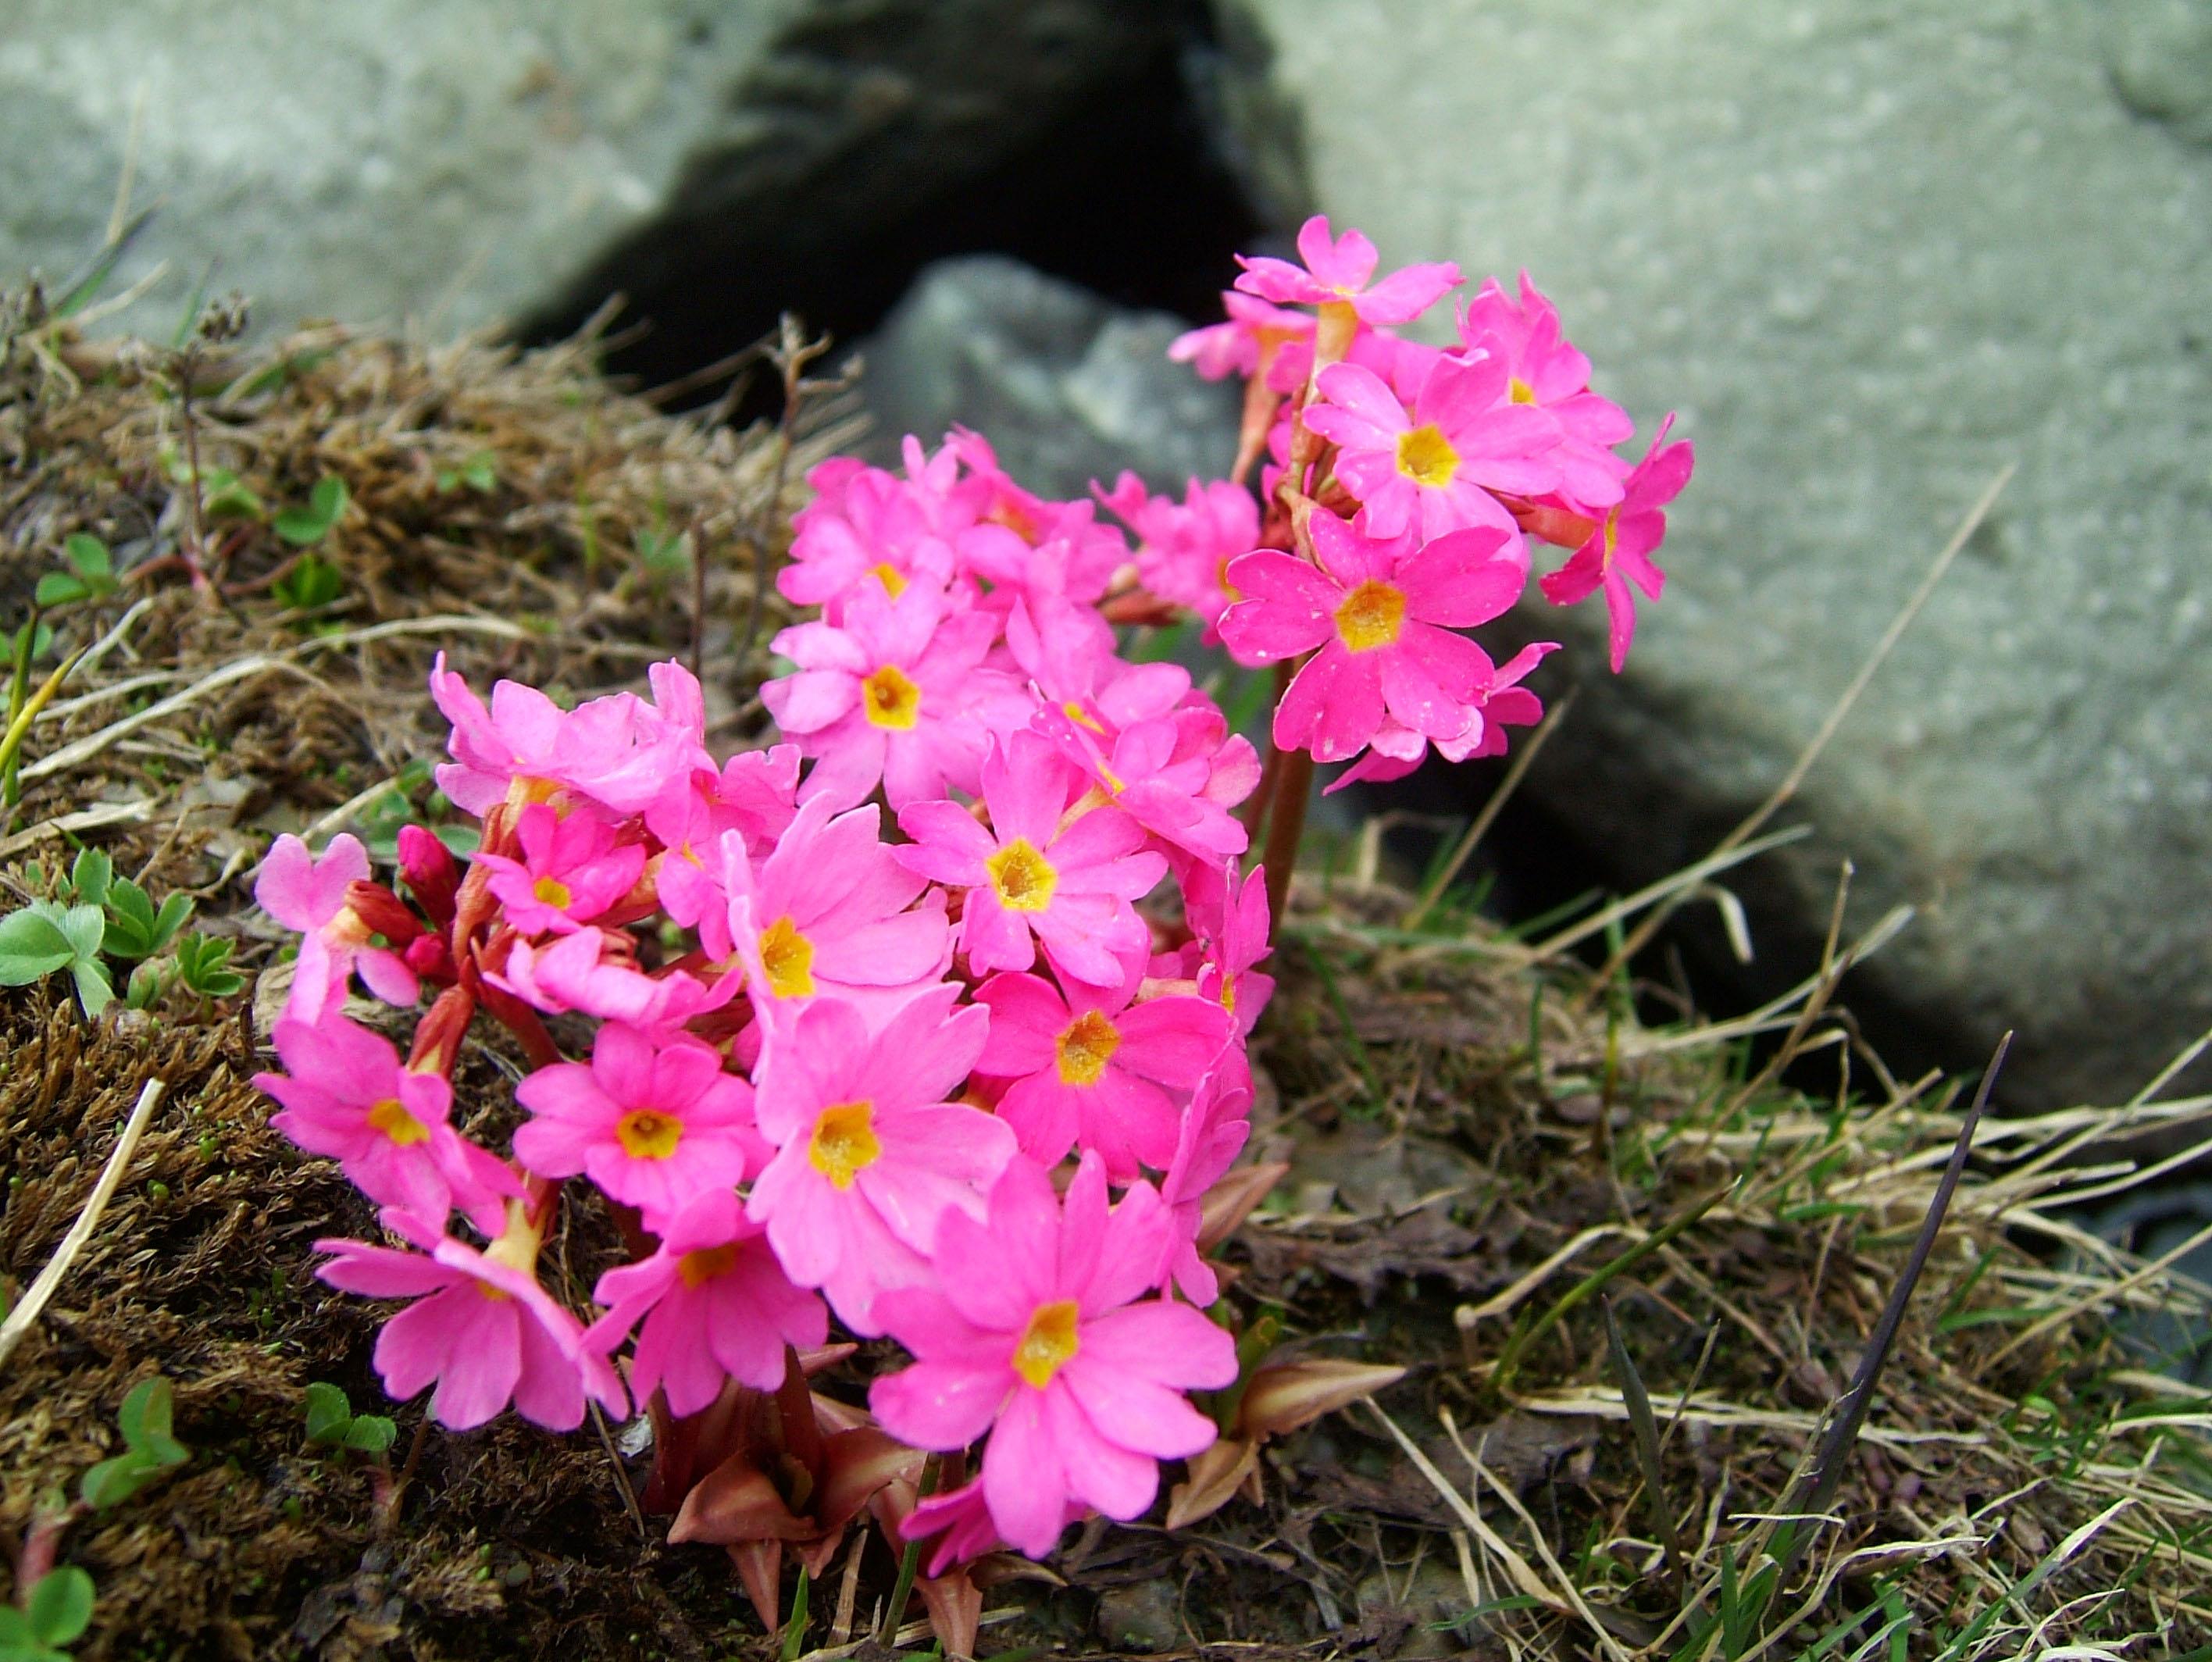 Local Wild spring flowers Srinagar Kashmir India 15